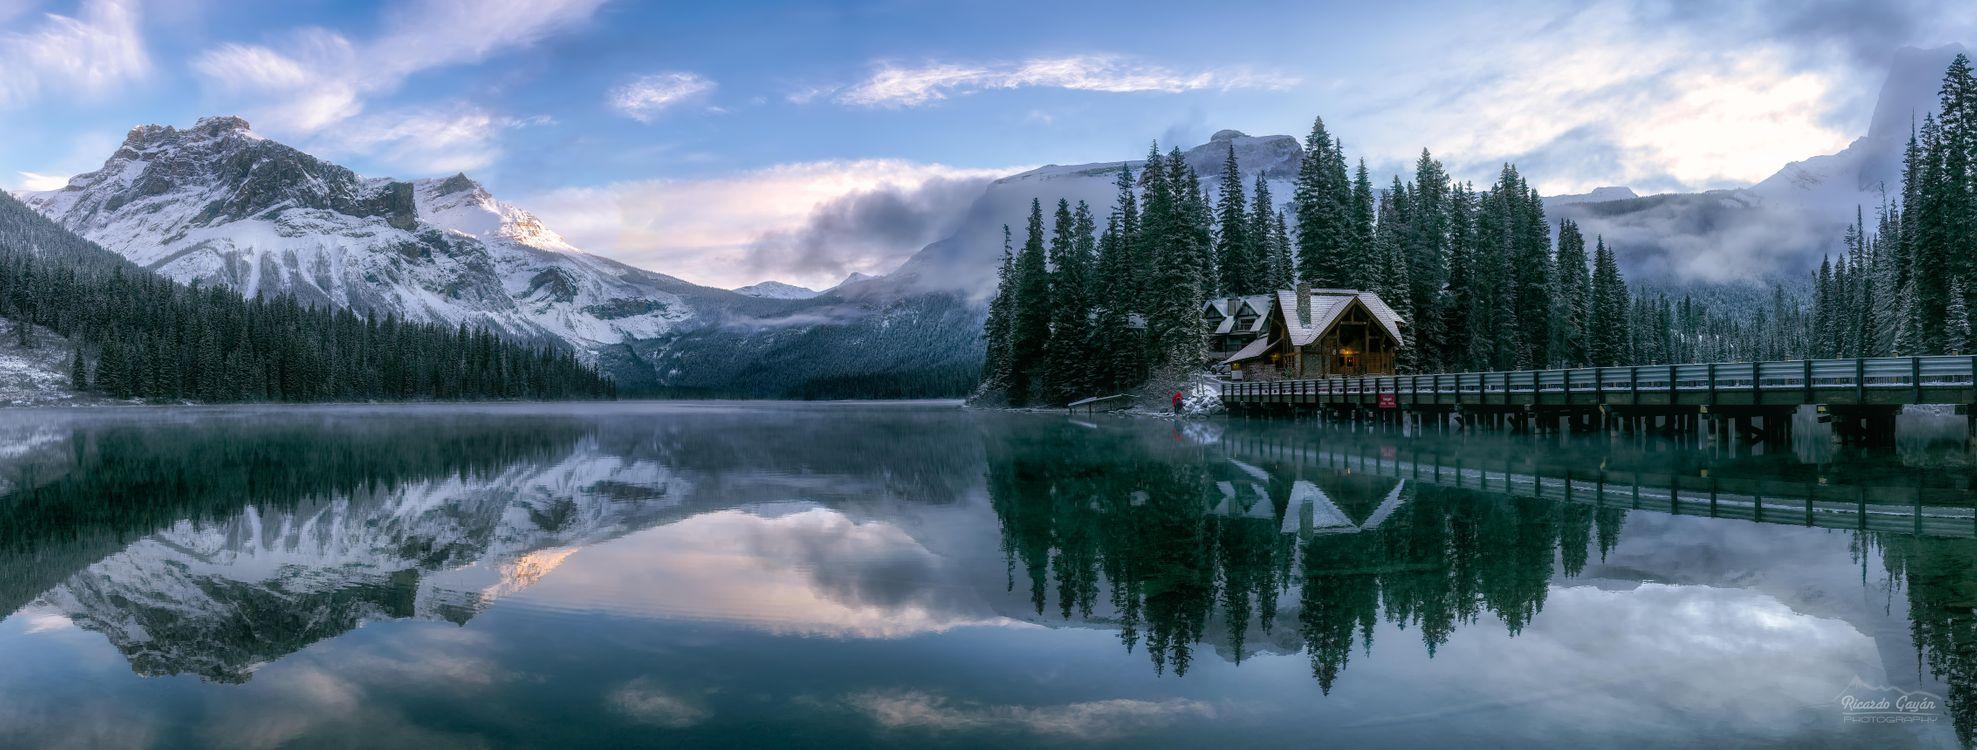 Free photo landscape, house, Emerald Lake - to desktop